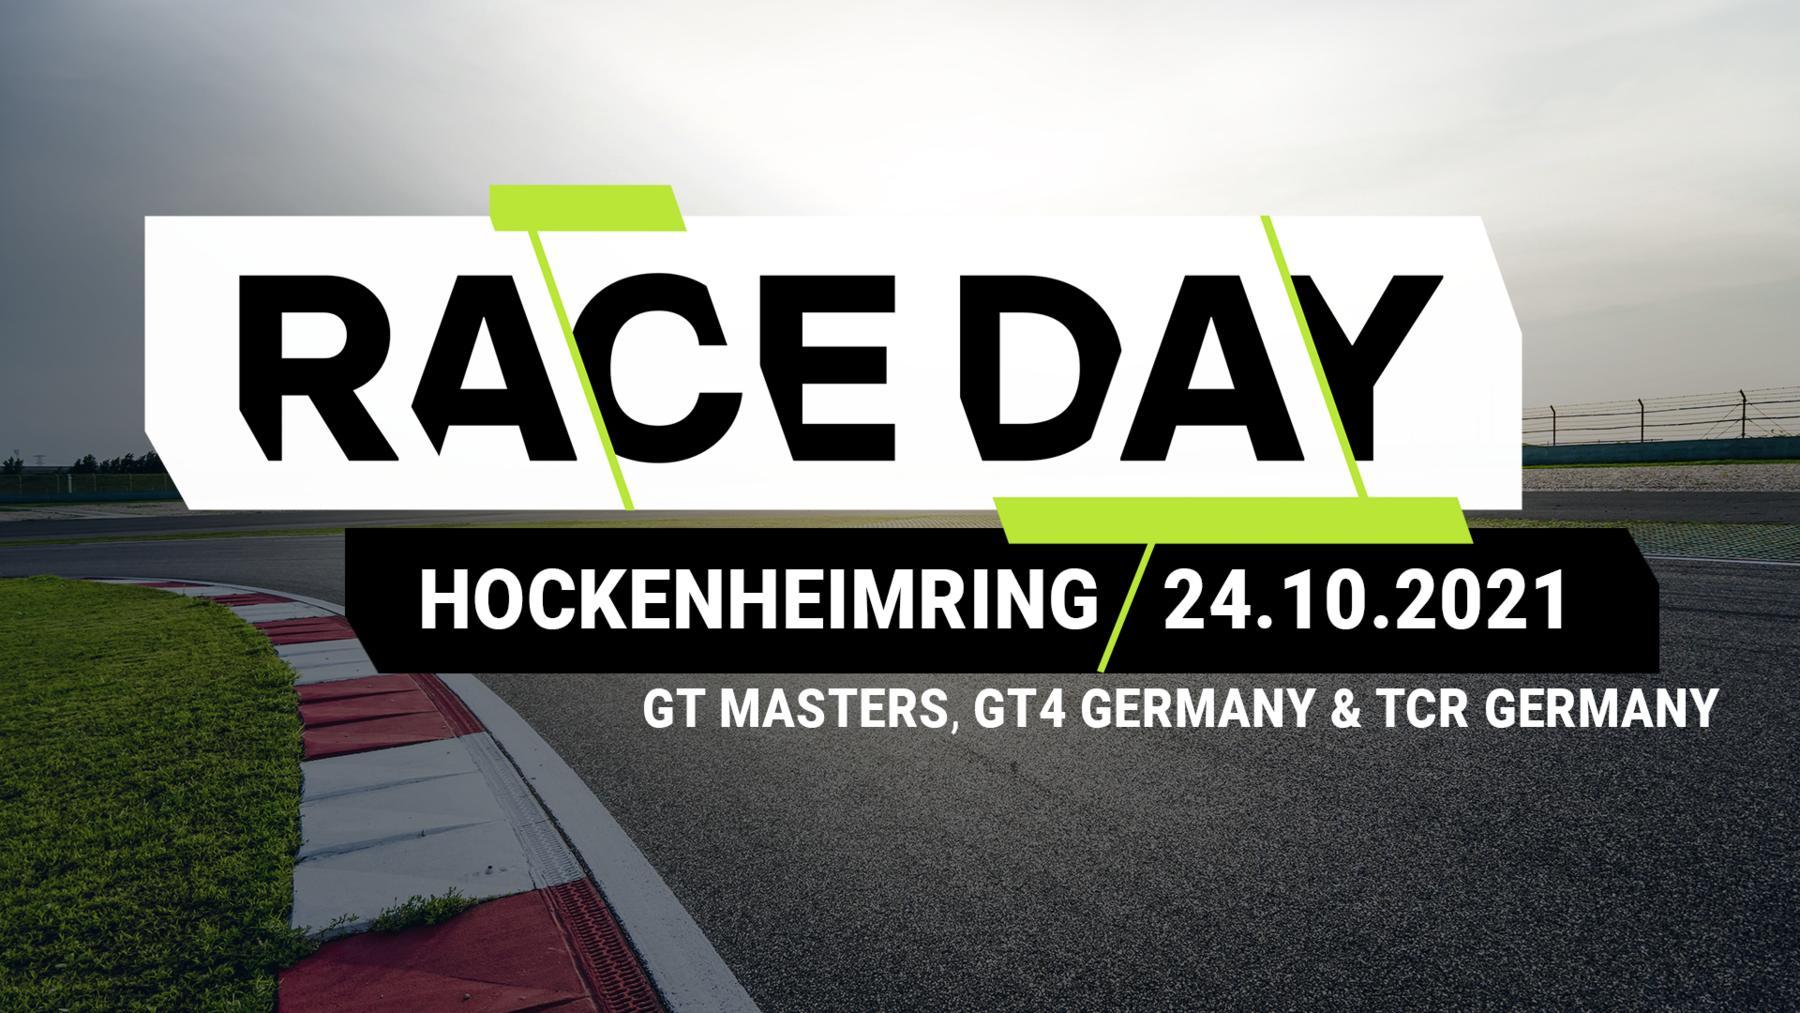 Raceday - Hockenheimring